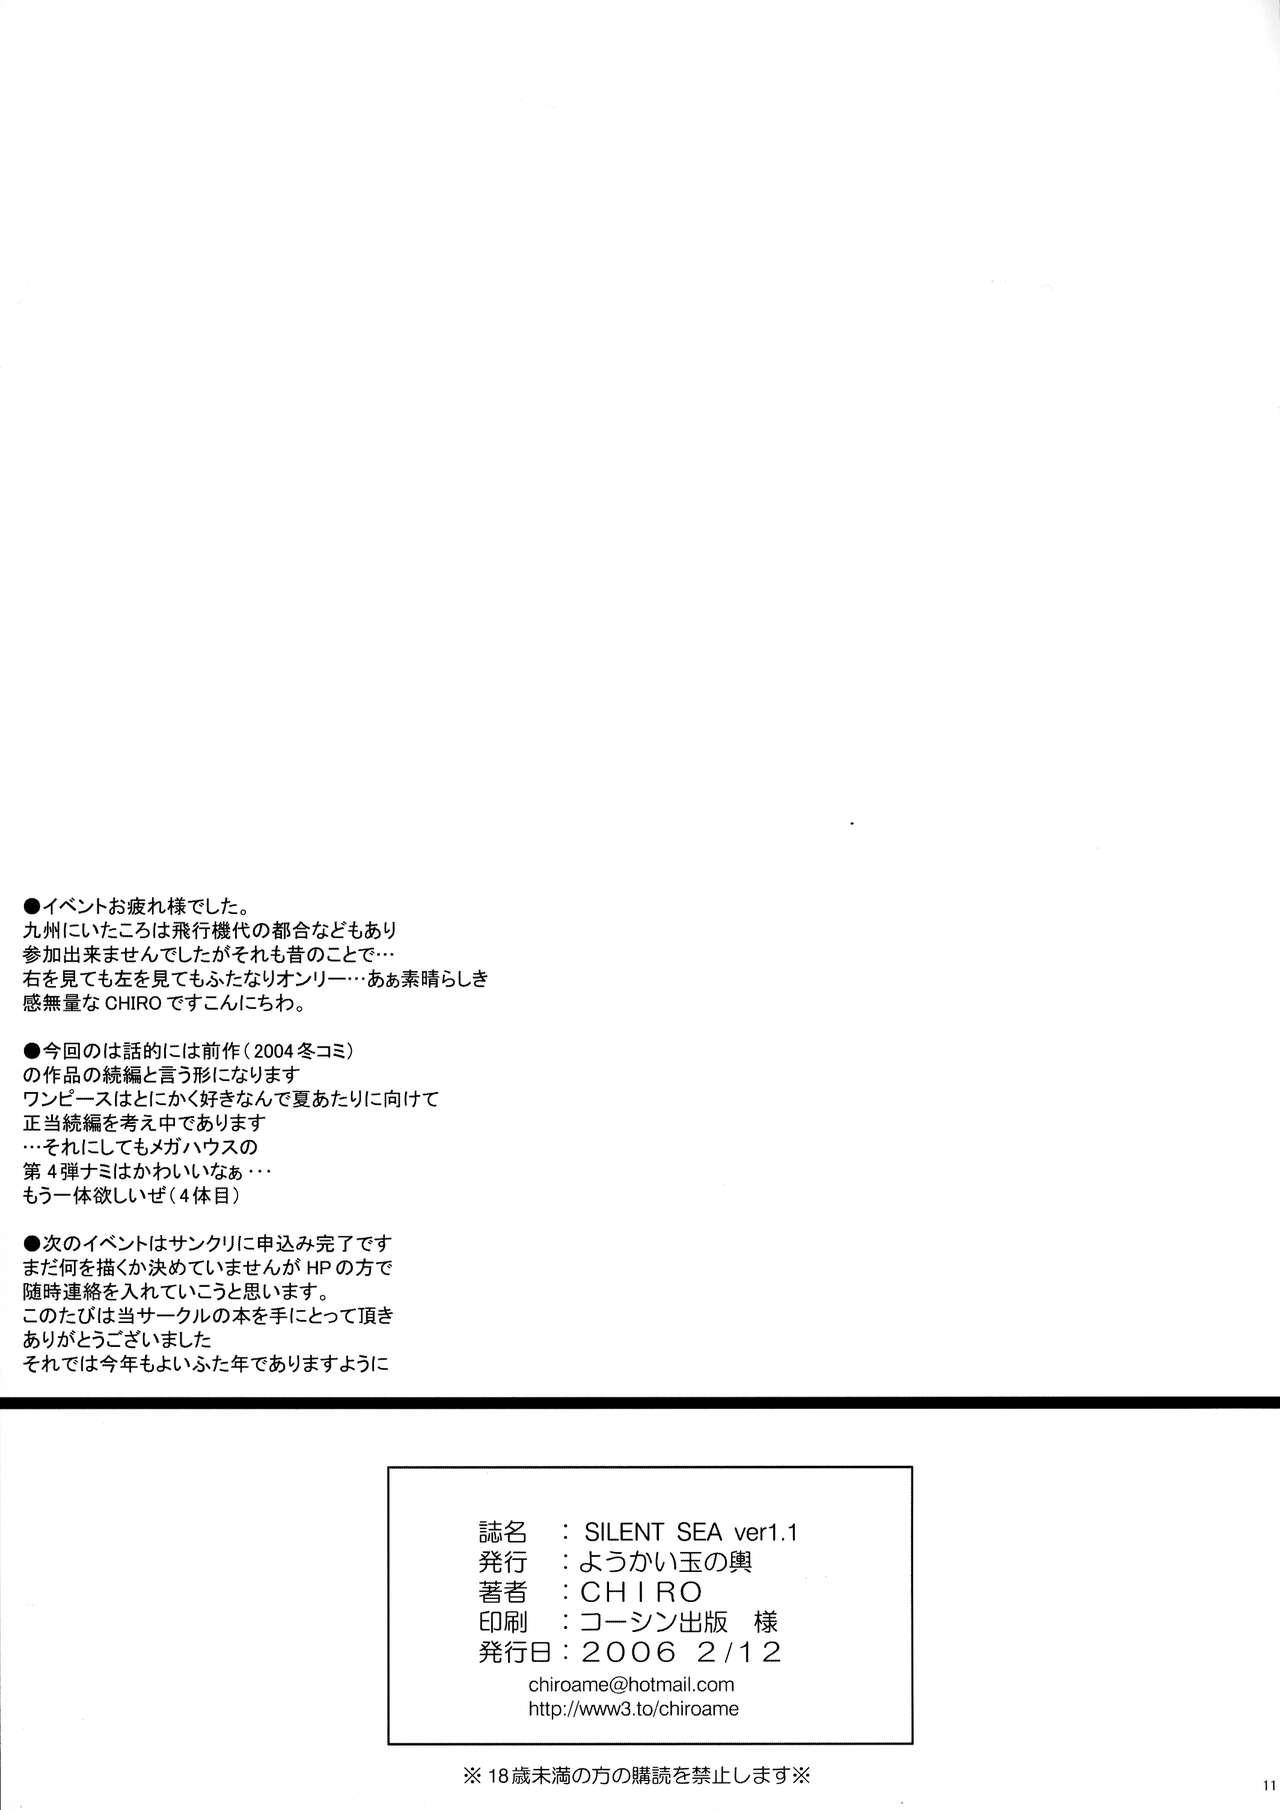 SILENT SEA vol.1.1 10